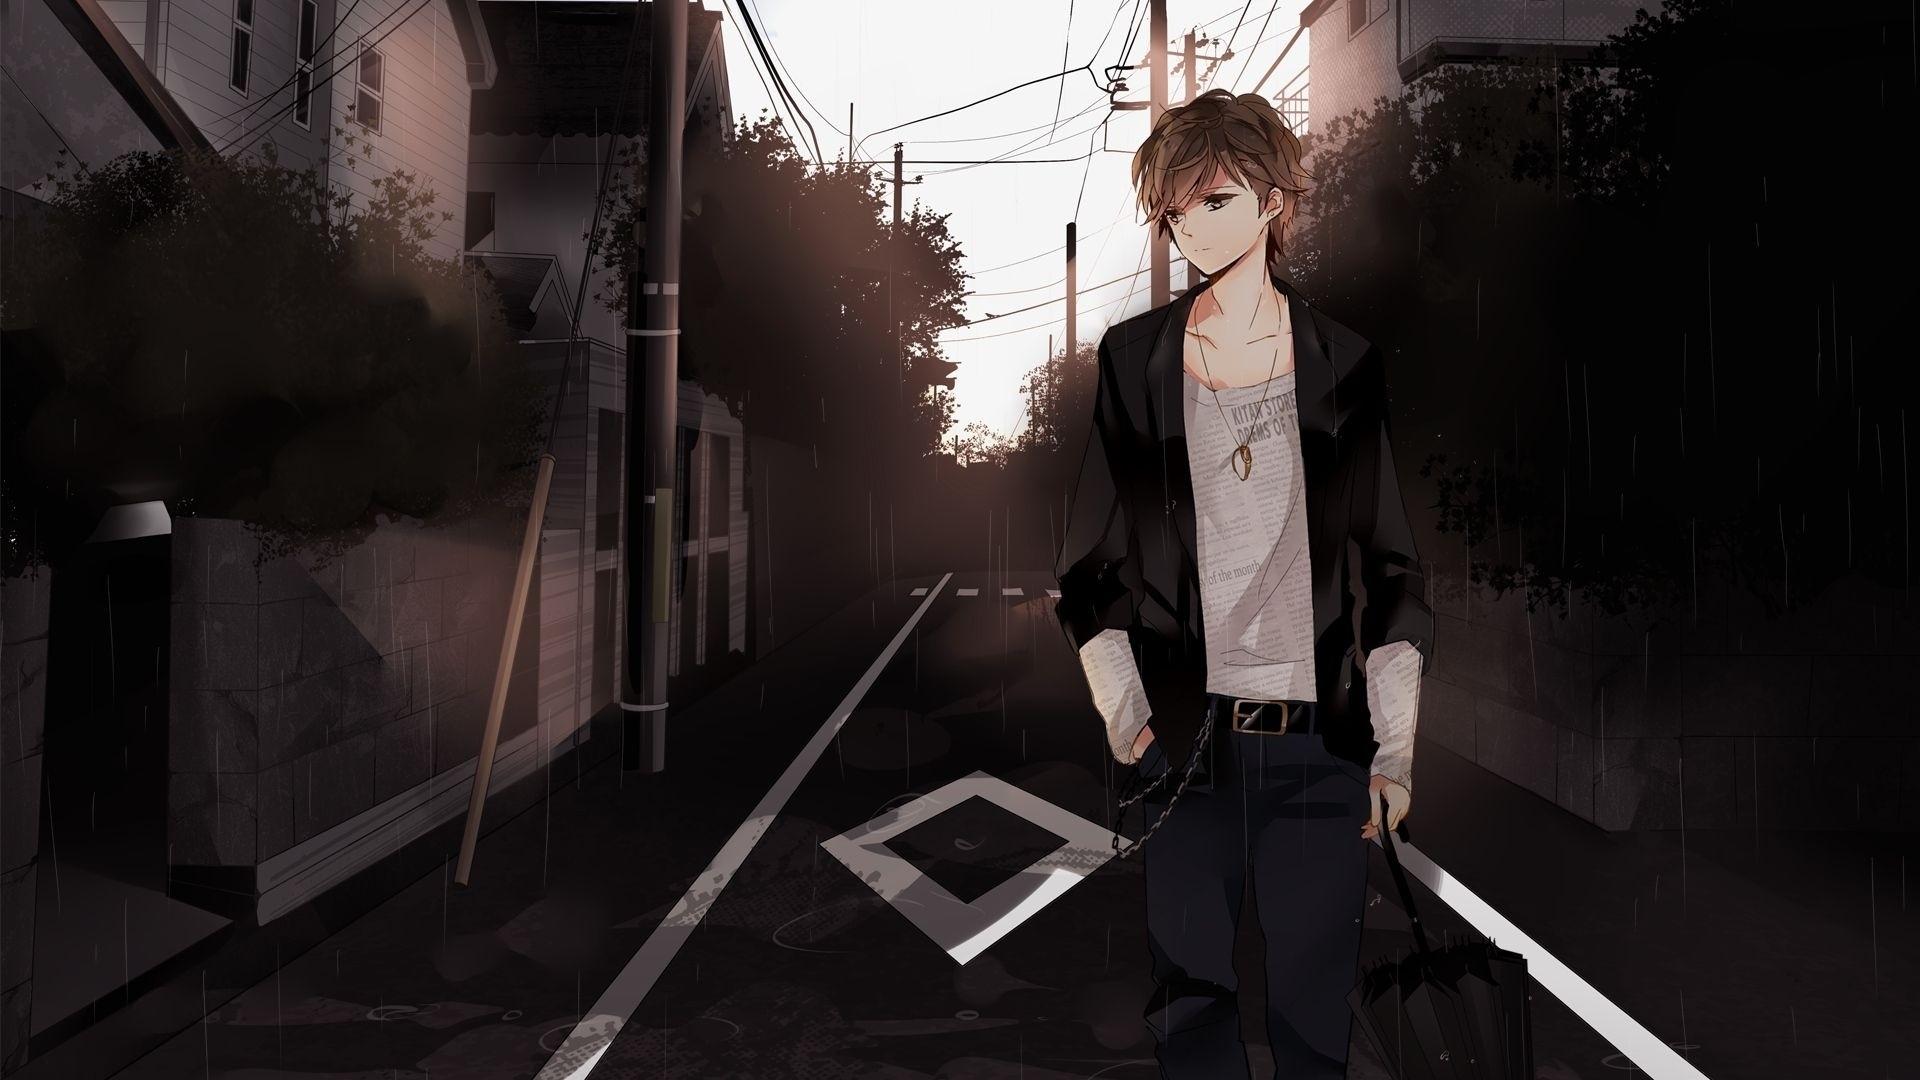 Handsome Anime Boy Background Wallpaper